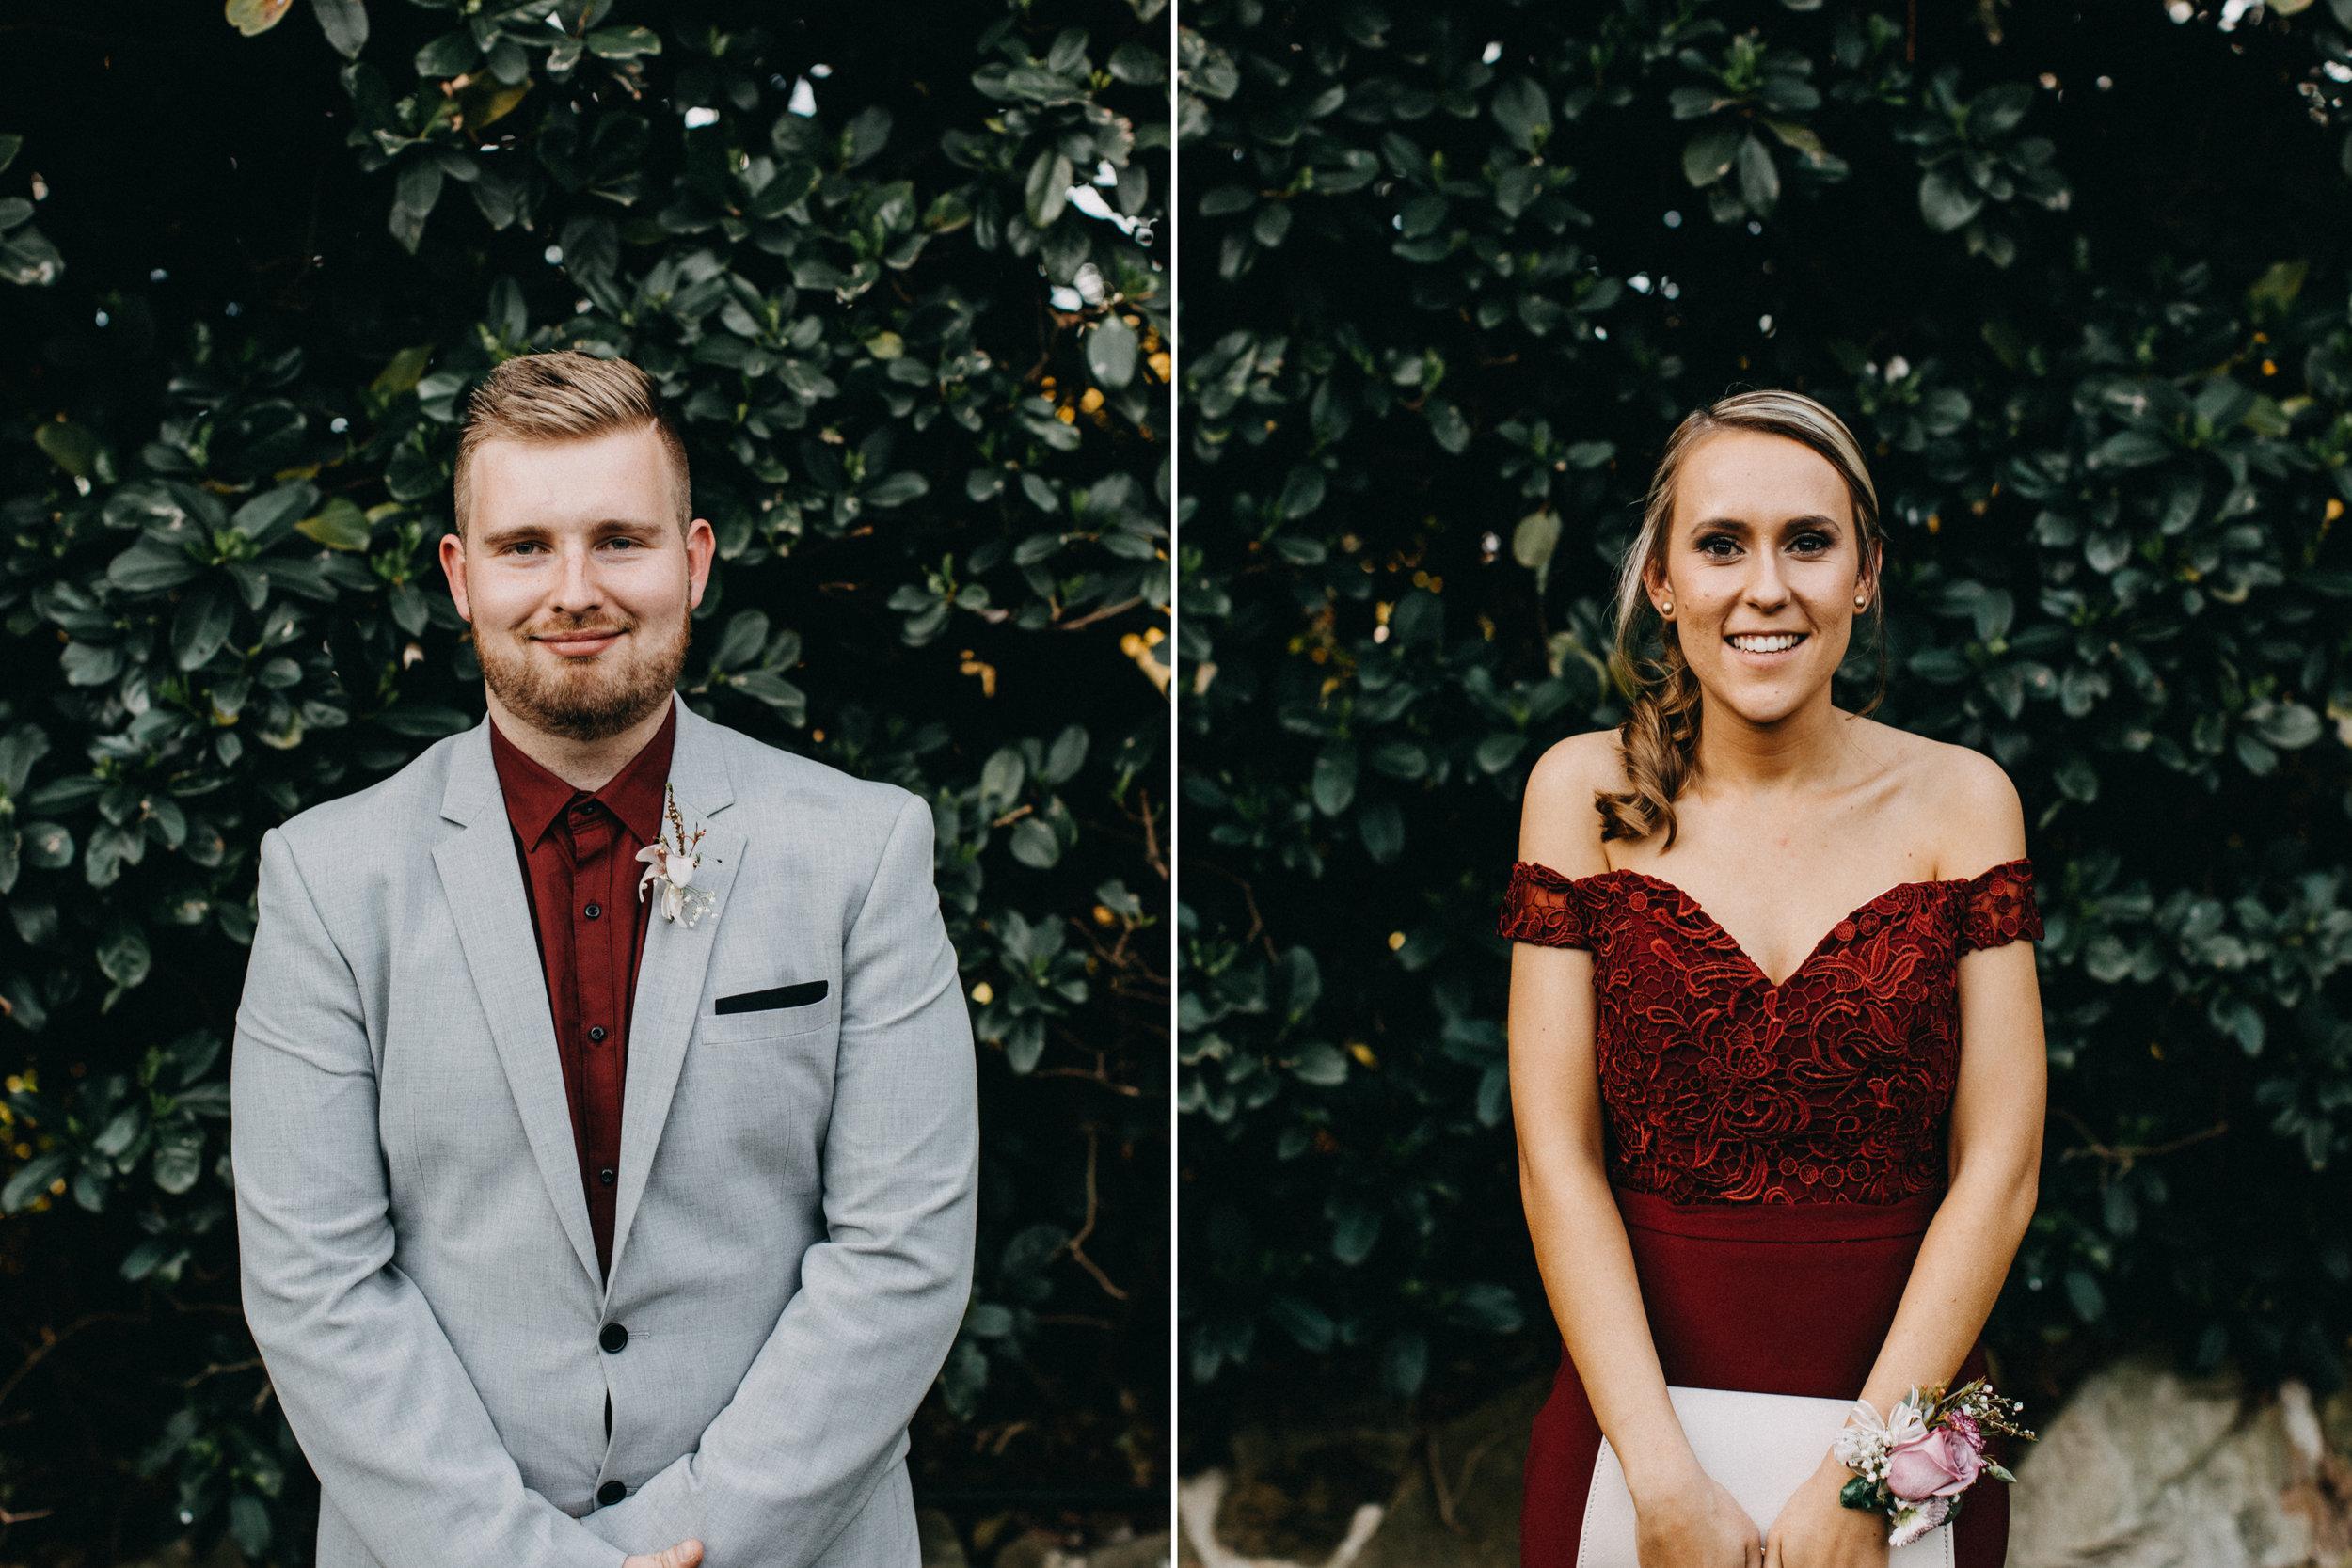 burnham-grove-camden-wedding-emilyobrienphotography-3.jpg